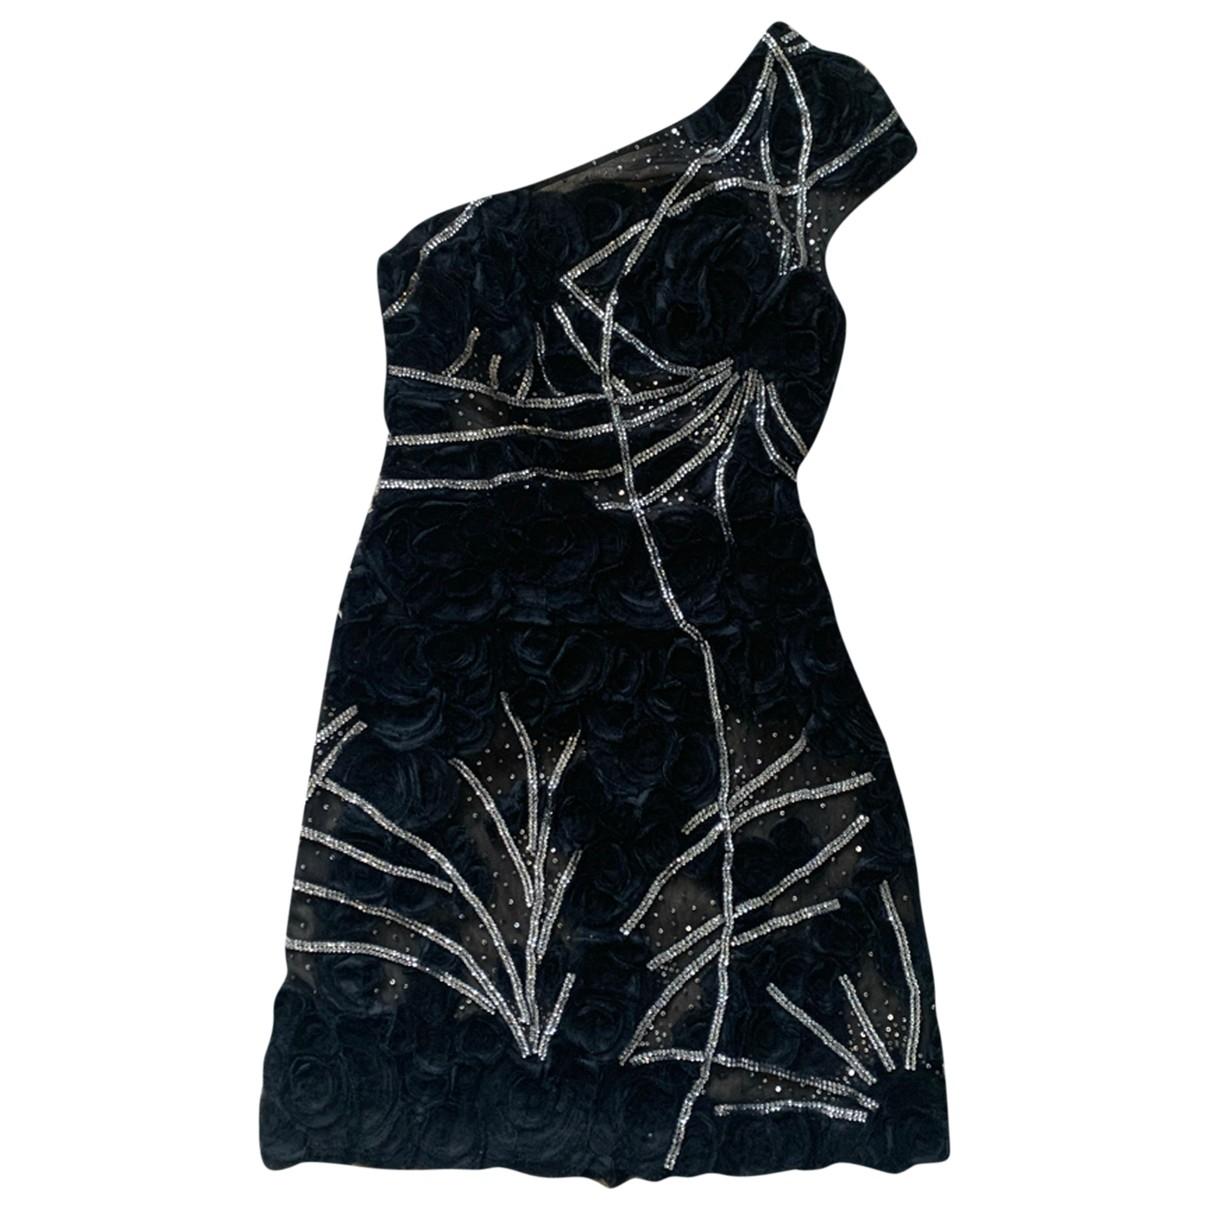 Zuhair Murad - Robe   pour femme en soie - noir